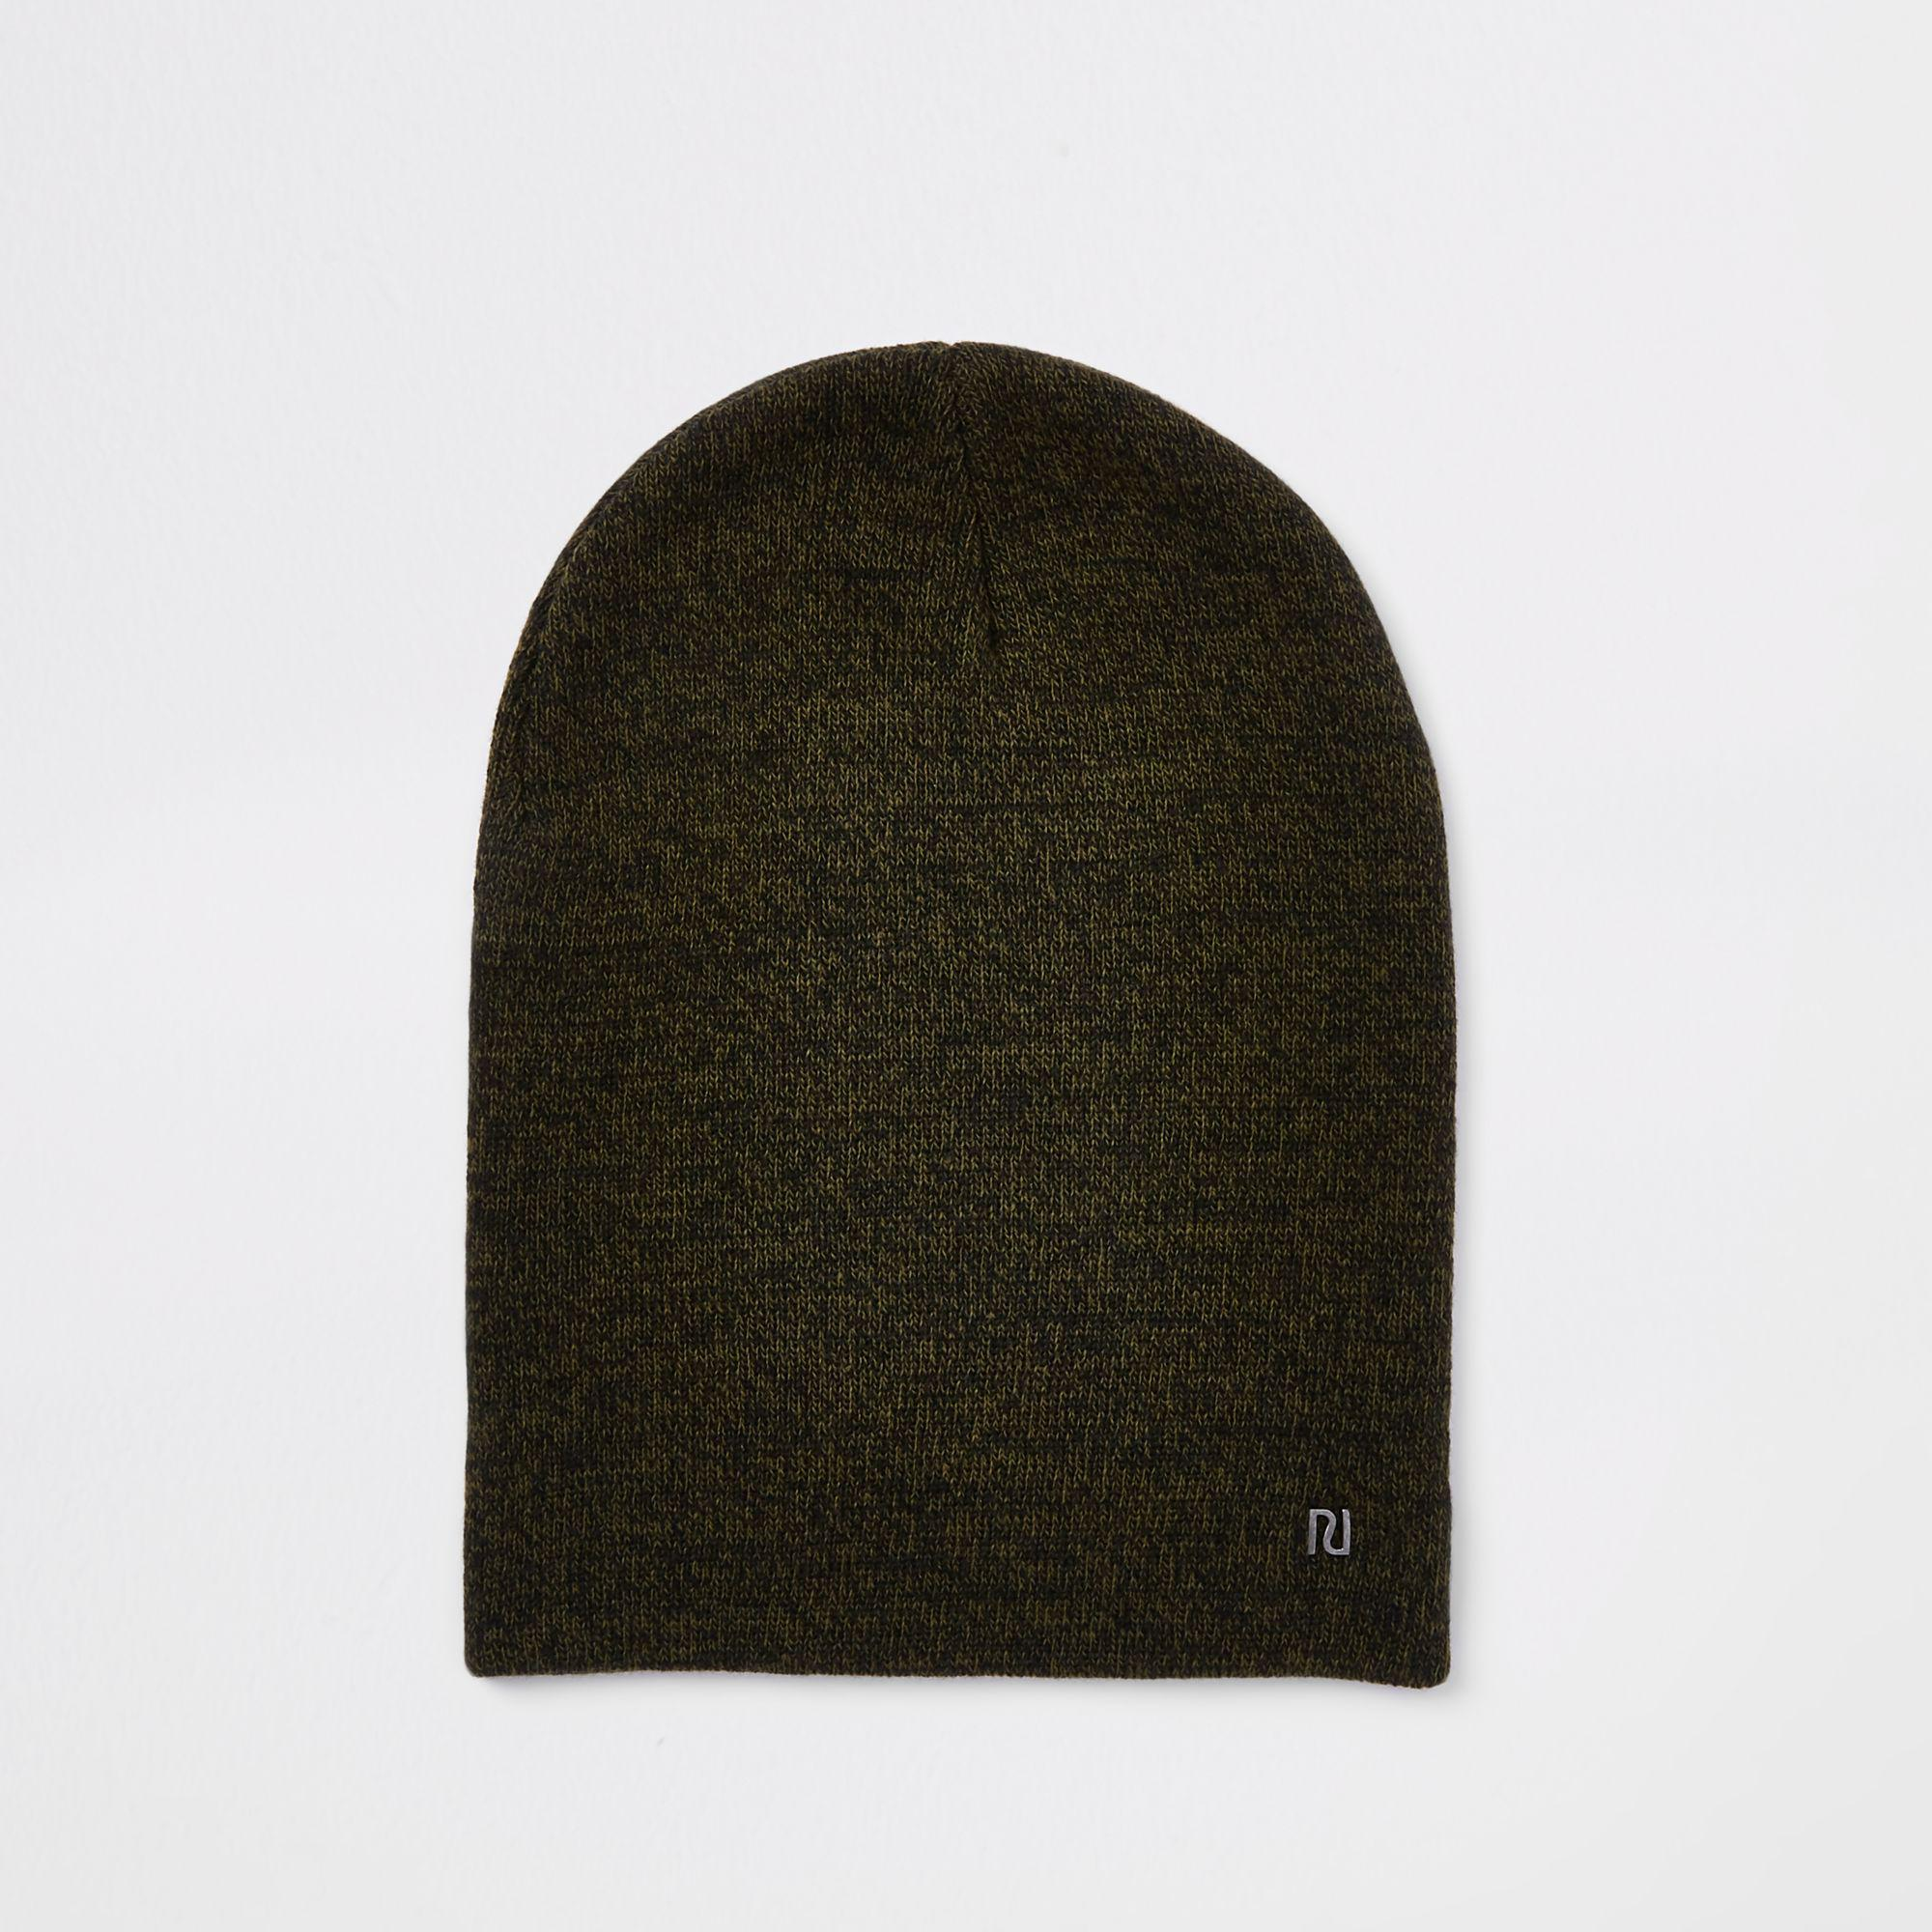 e0eaf65bae4 River Island Green Twist Knit Slouch Beanie Hat in Green for Men - Lyst